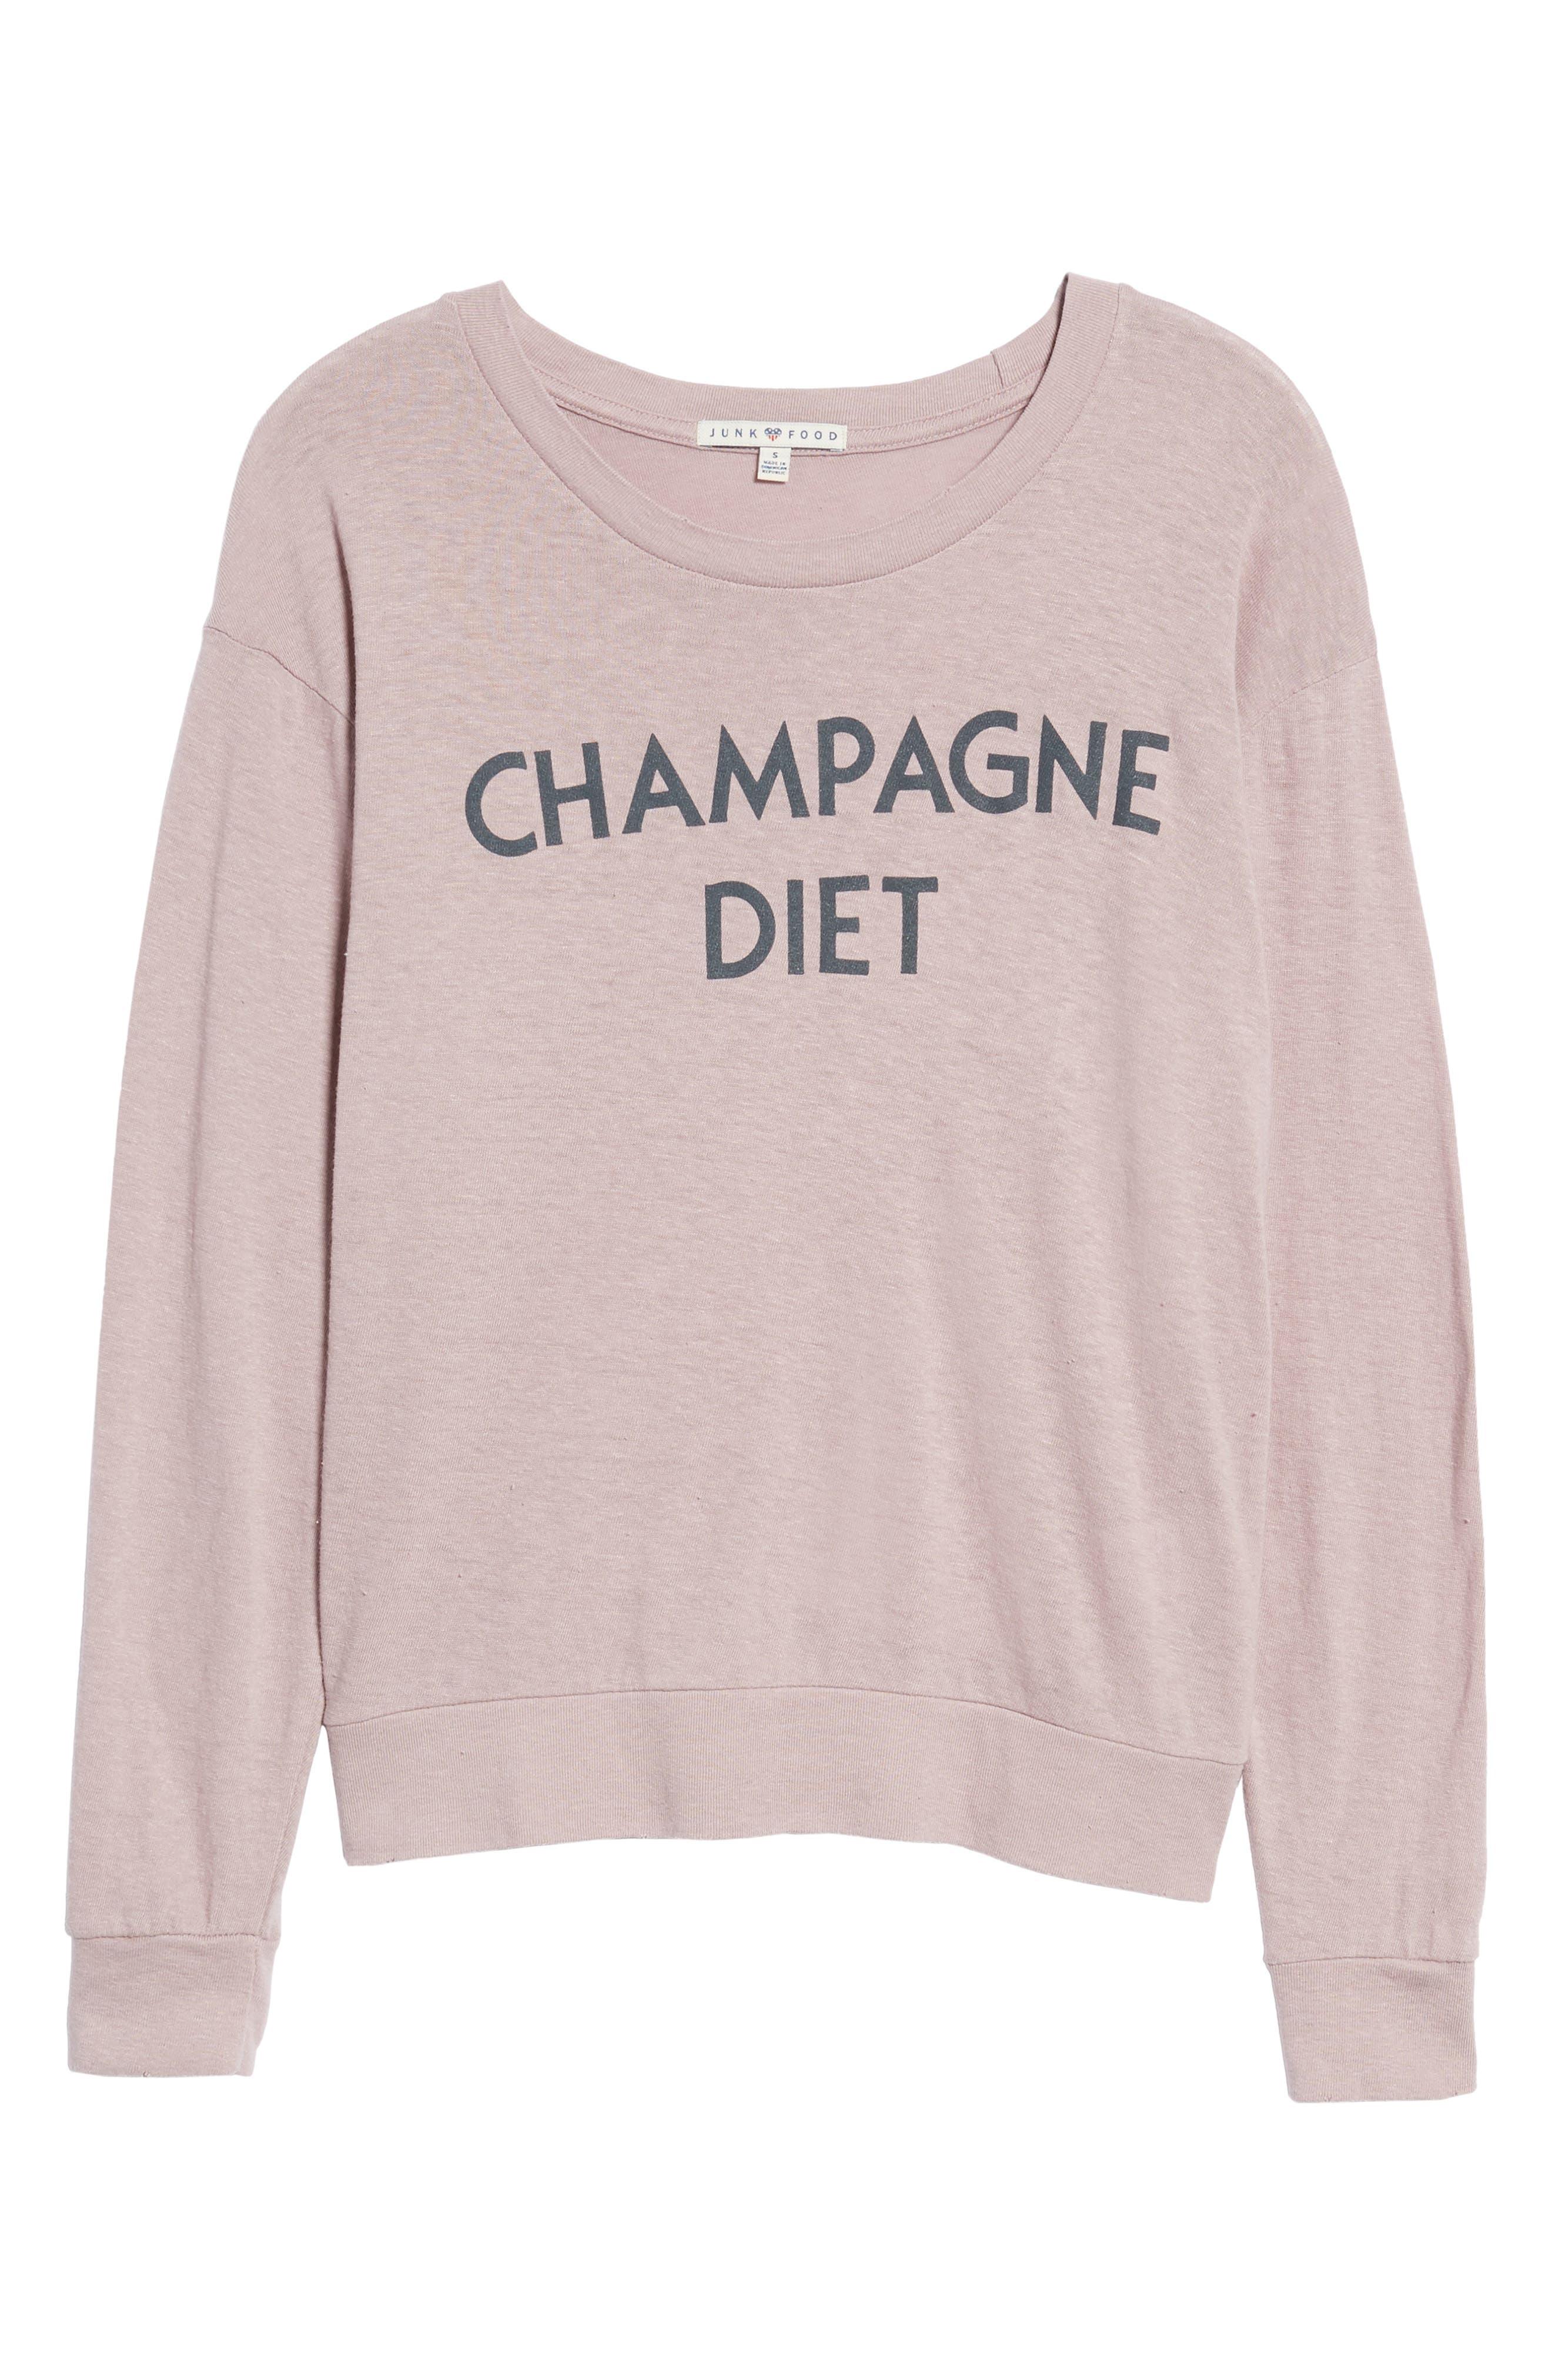 Champagne Diet Sweatshirt,                             Alternate thumbnail 6, color,                             650